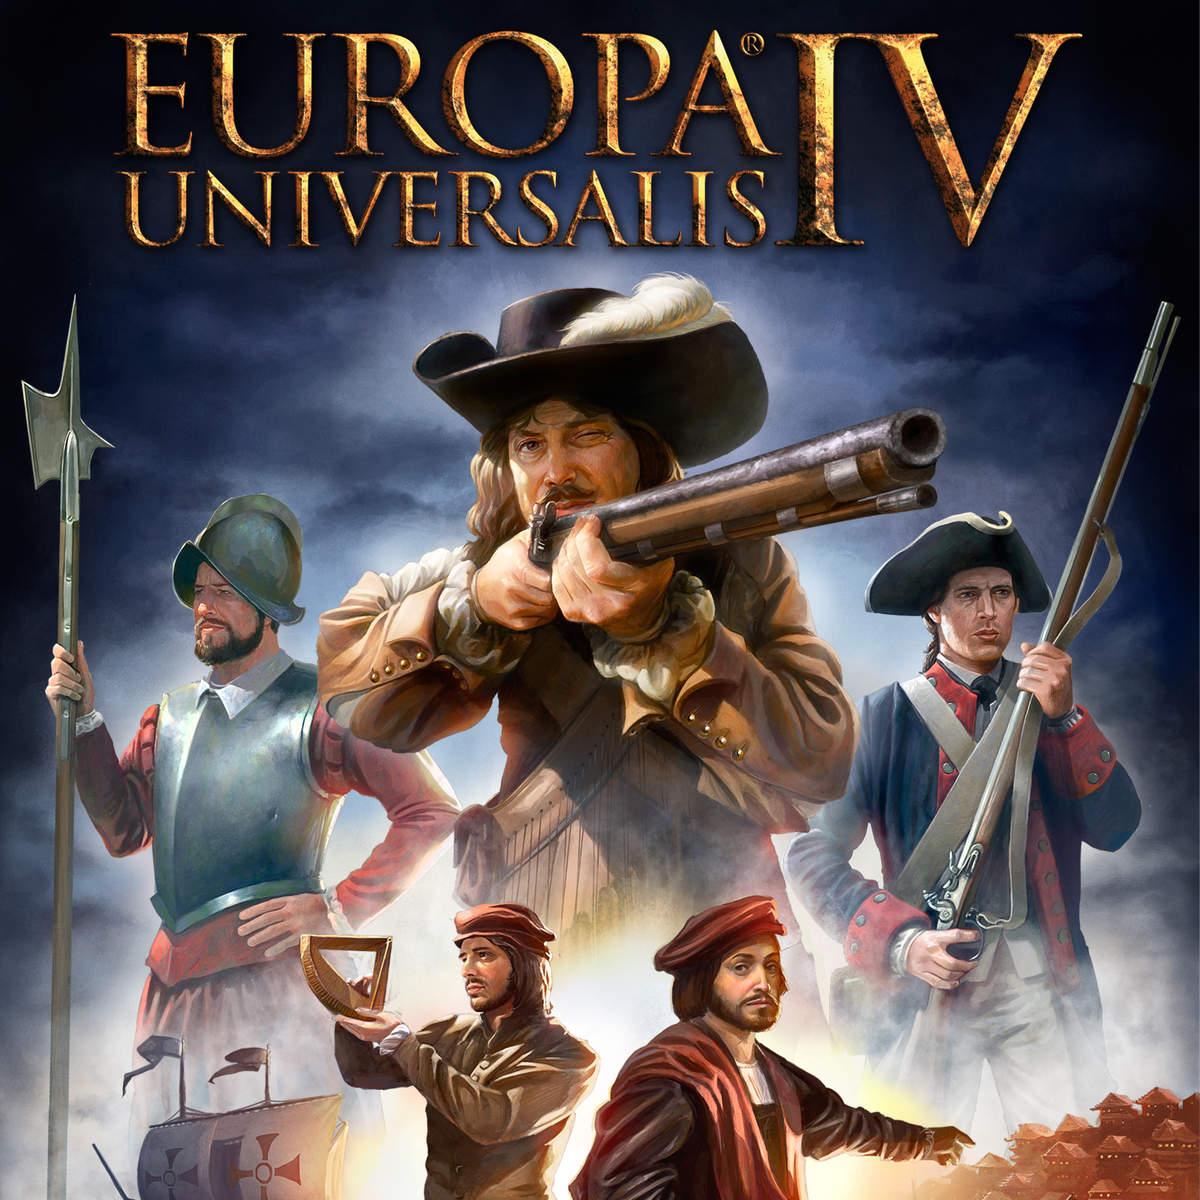 Europa_Universalis_4_Soundtrack__cover1200x1200.jpg